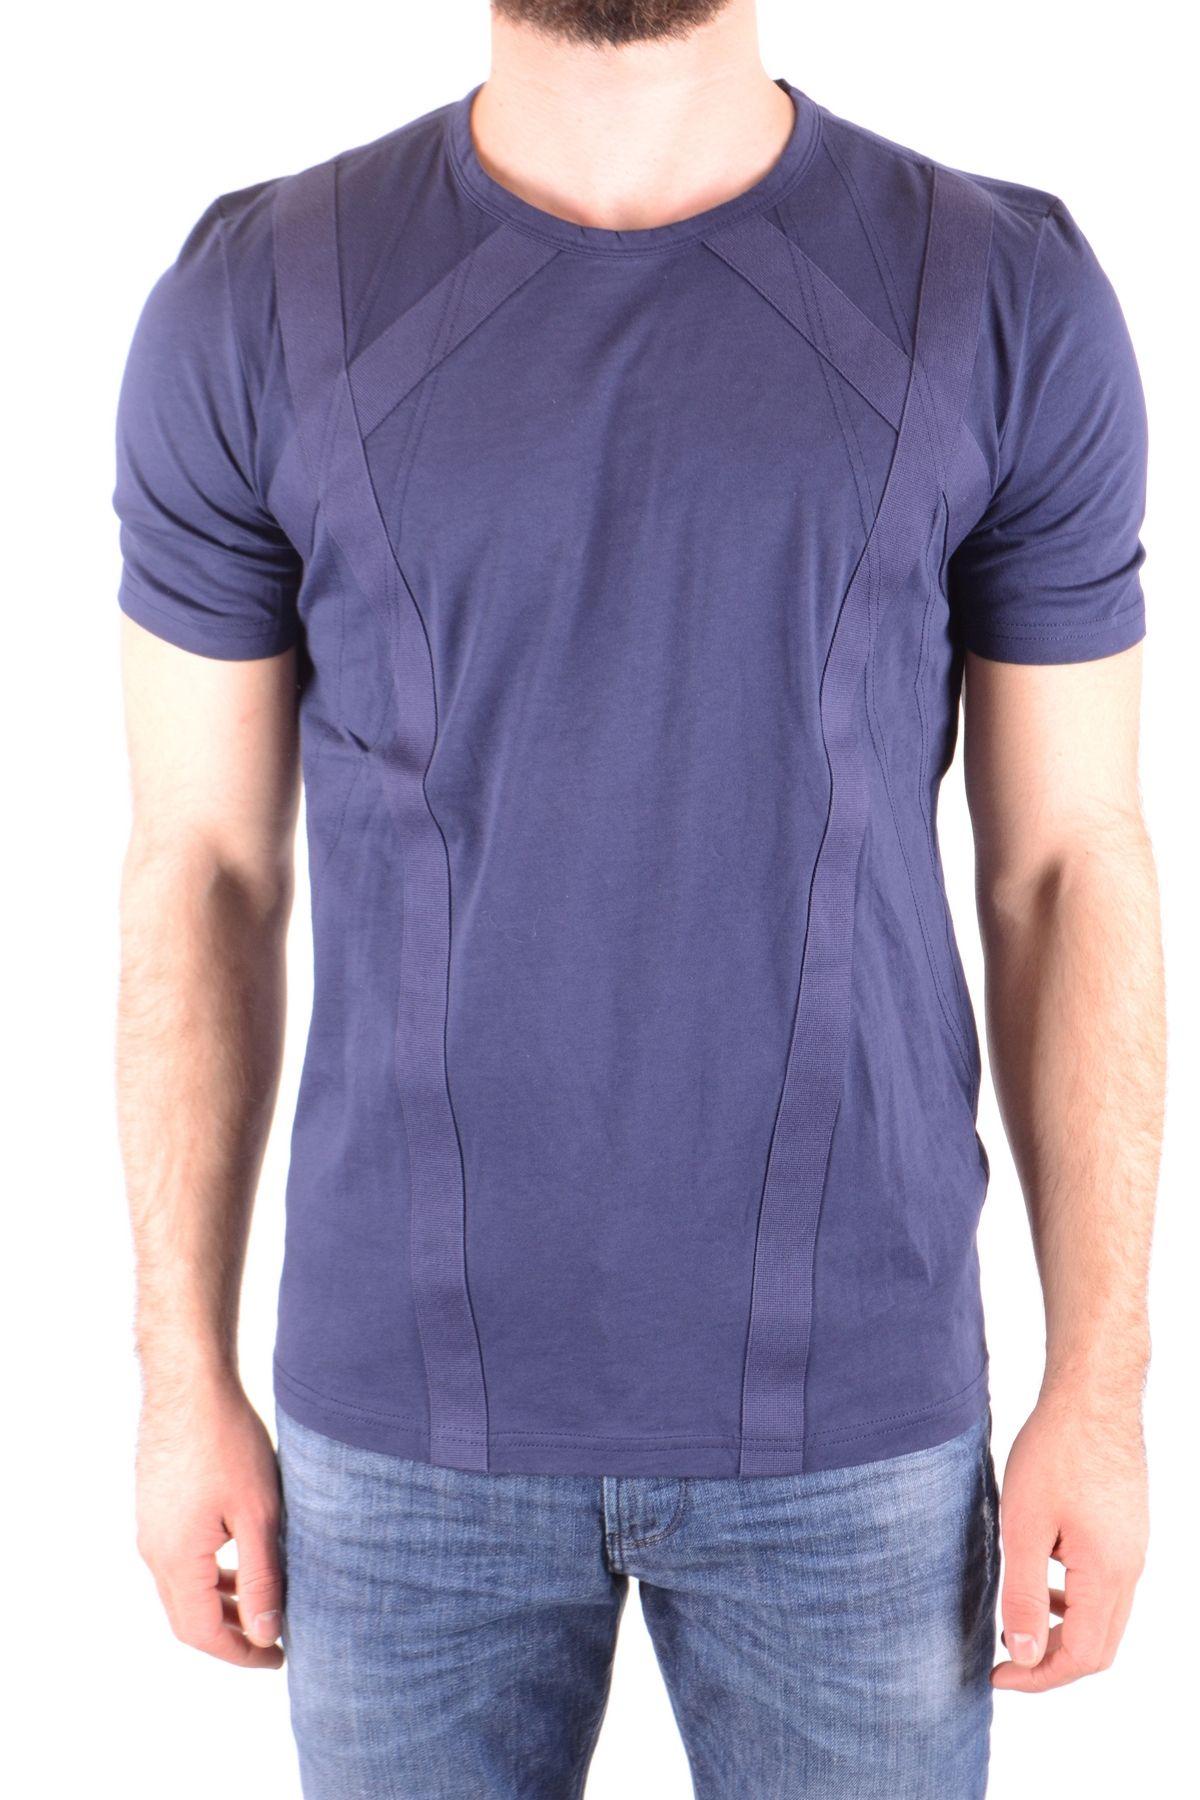 Diesel Black Gold Blue Cotton T-Shirt